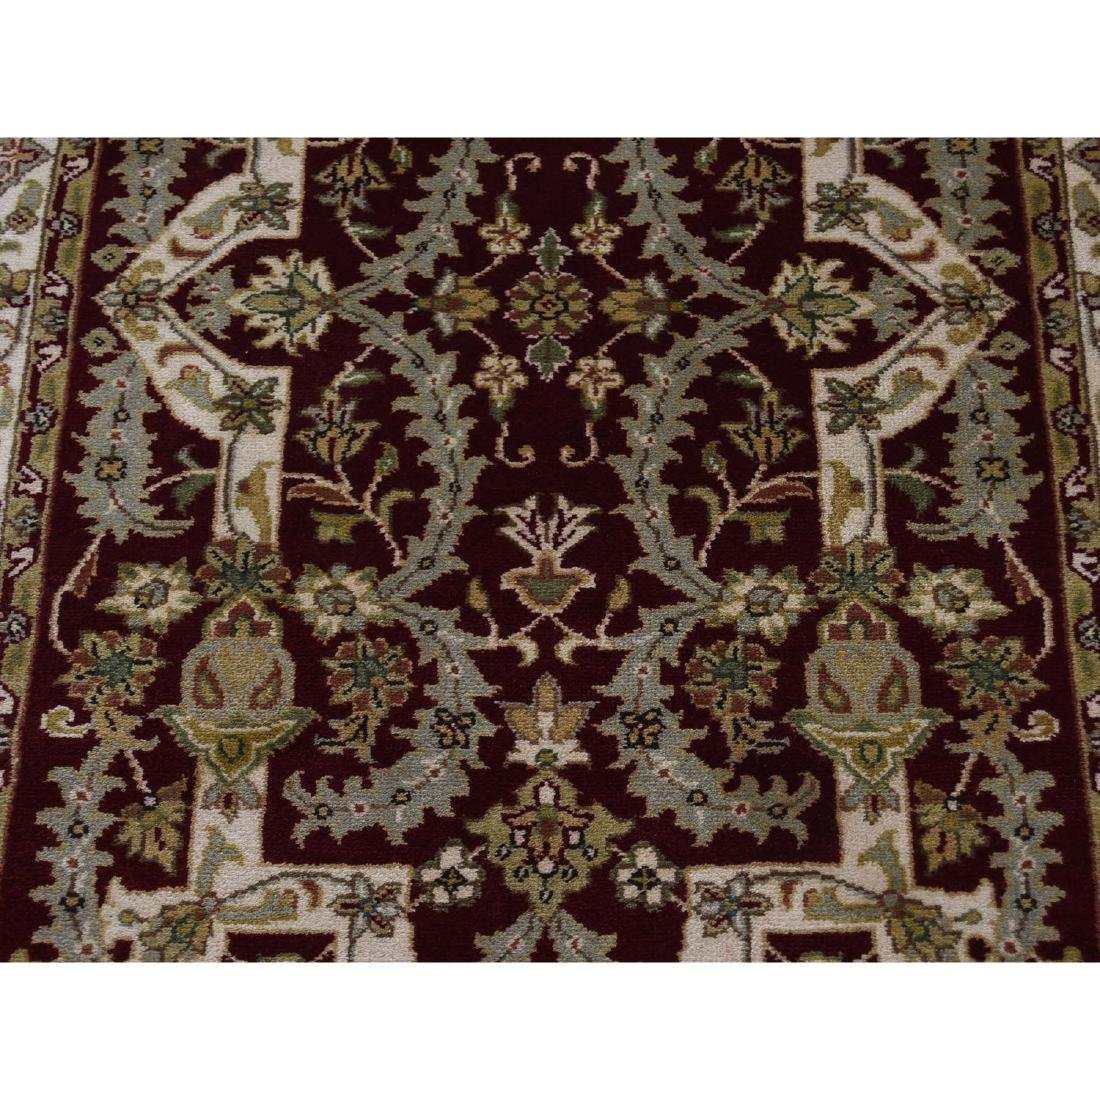 XL Runner Wool and Silk Tabriz Design 300 Kpsi Hand - 8